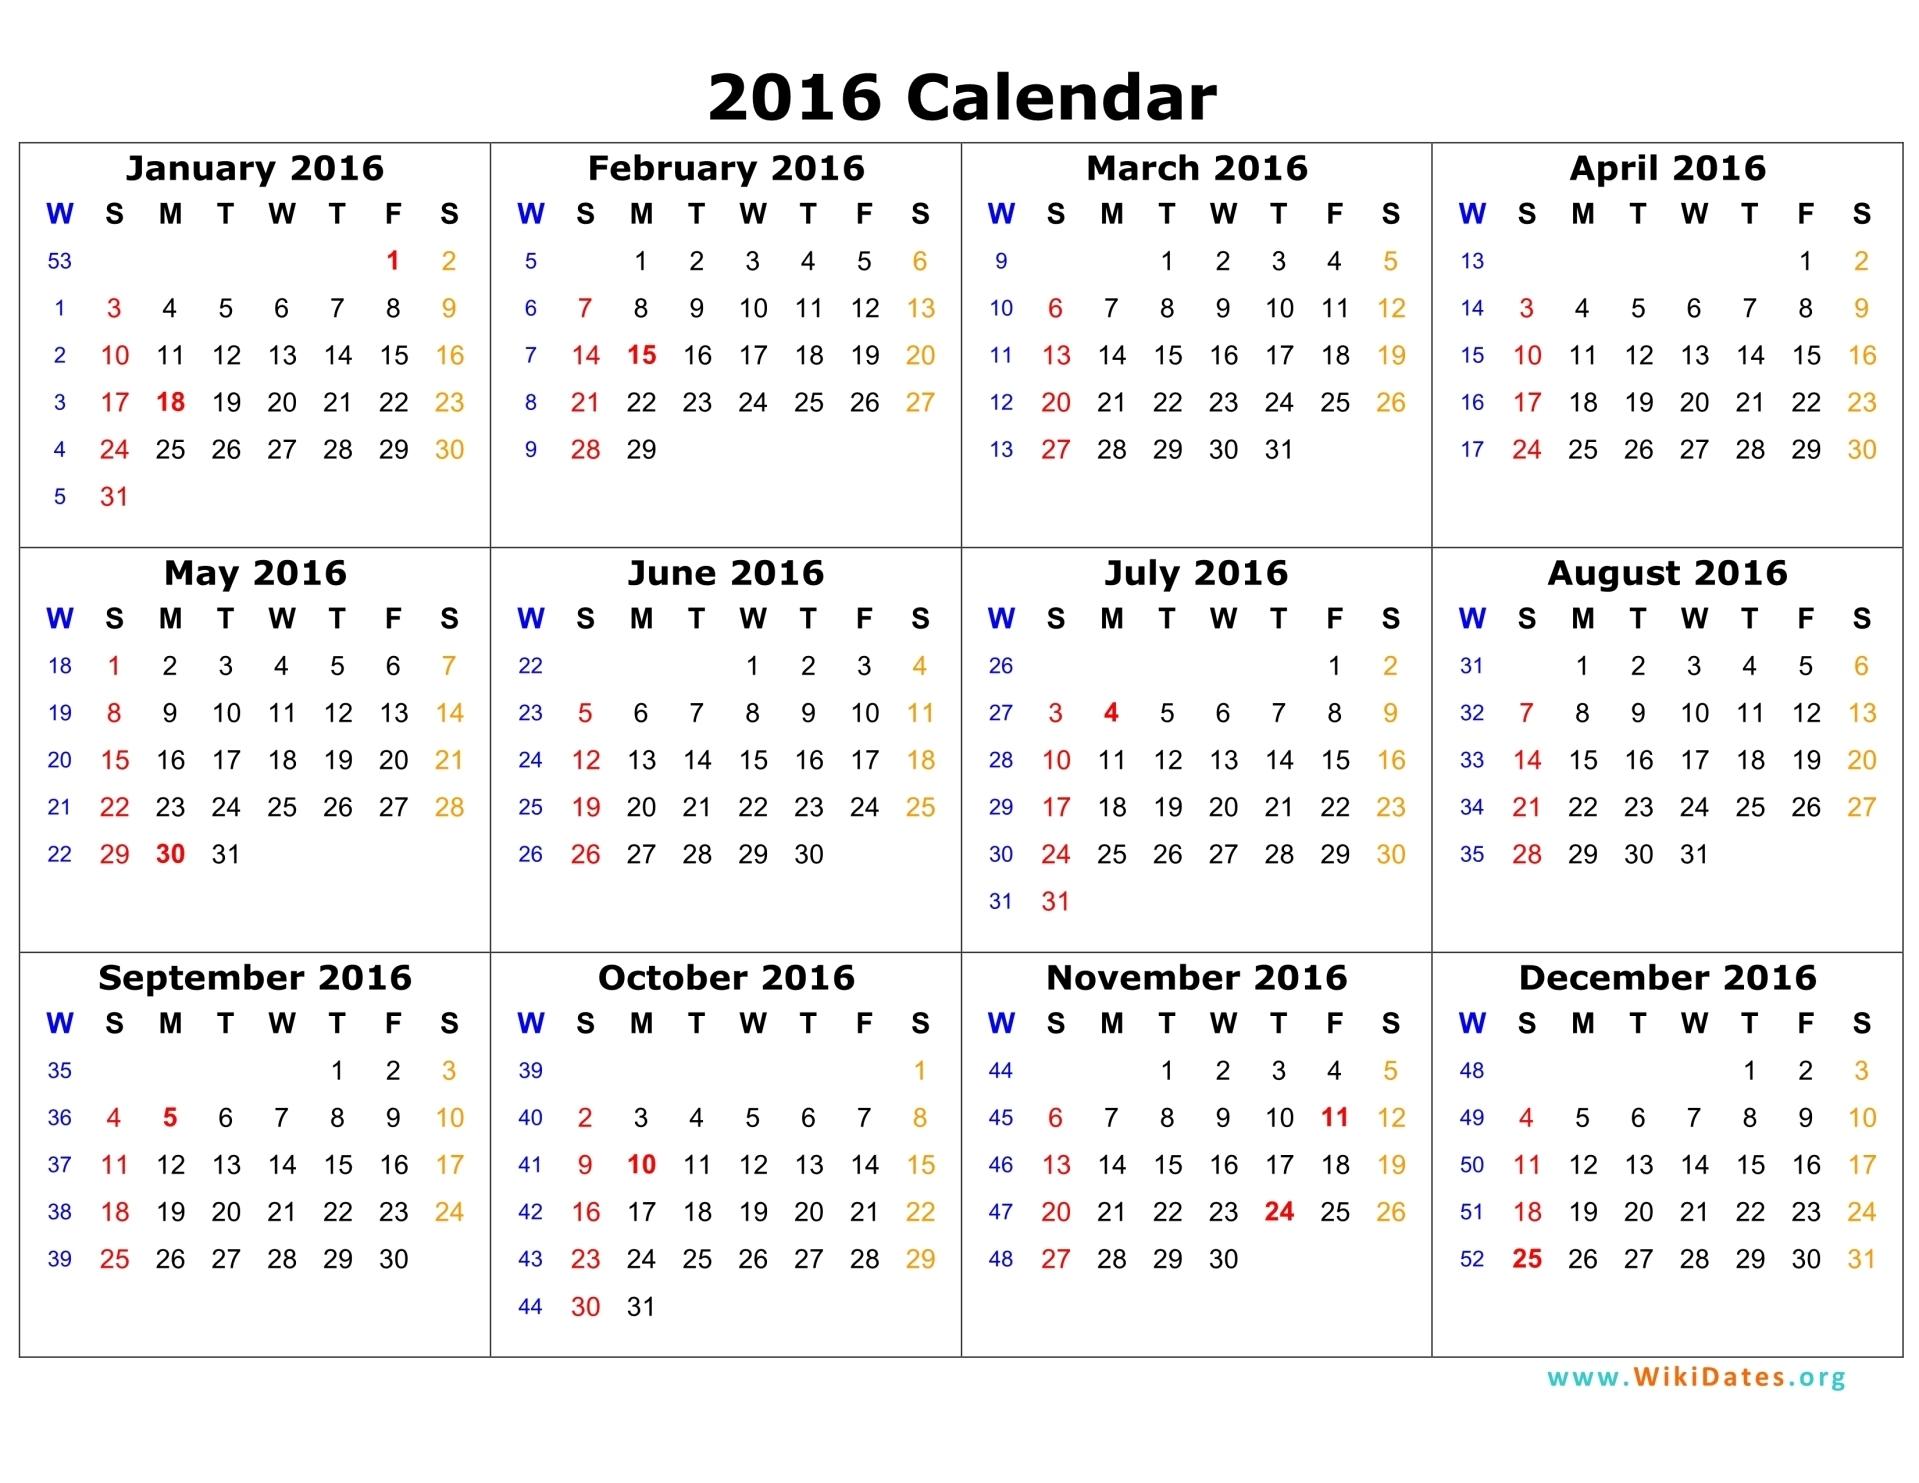 2016 Calendar Wikidates Org